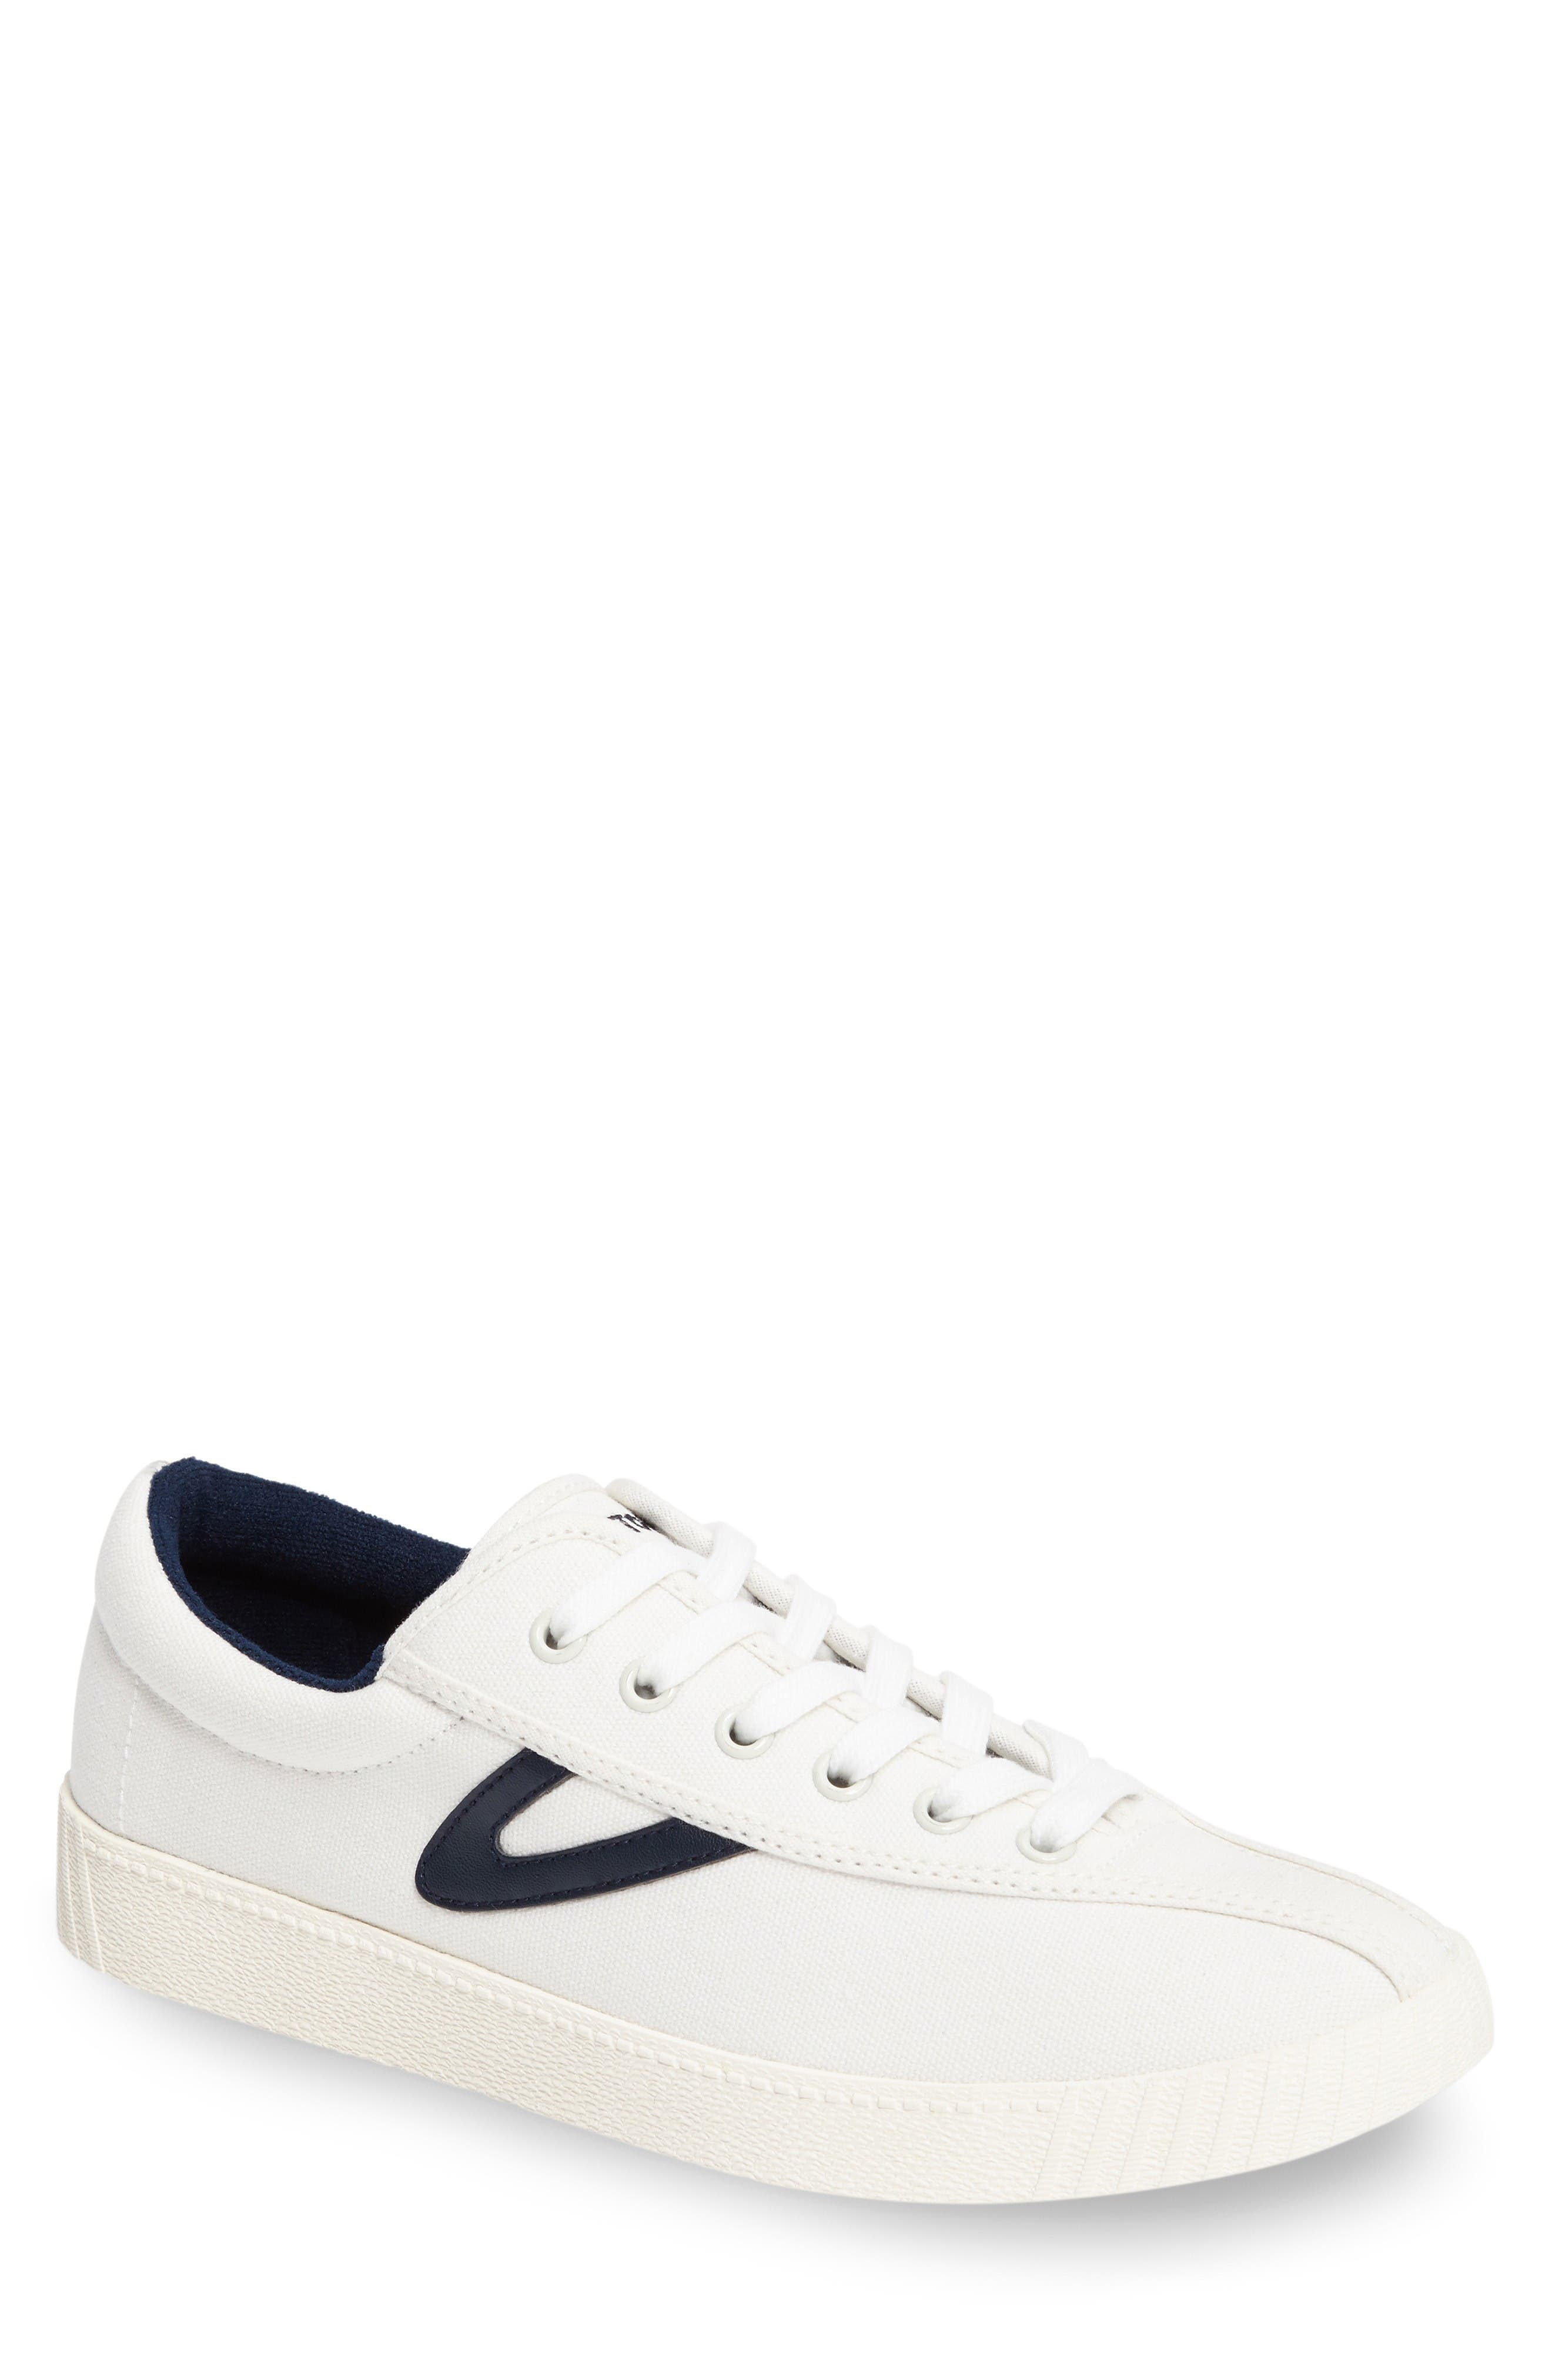 Nylite Plus Sneaker,                         Main,                         color, White/ White/ Night Canvas